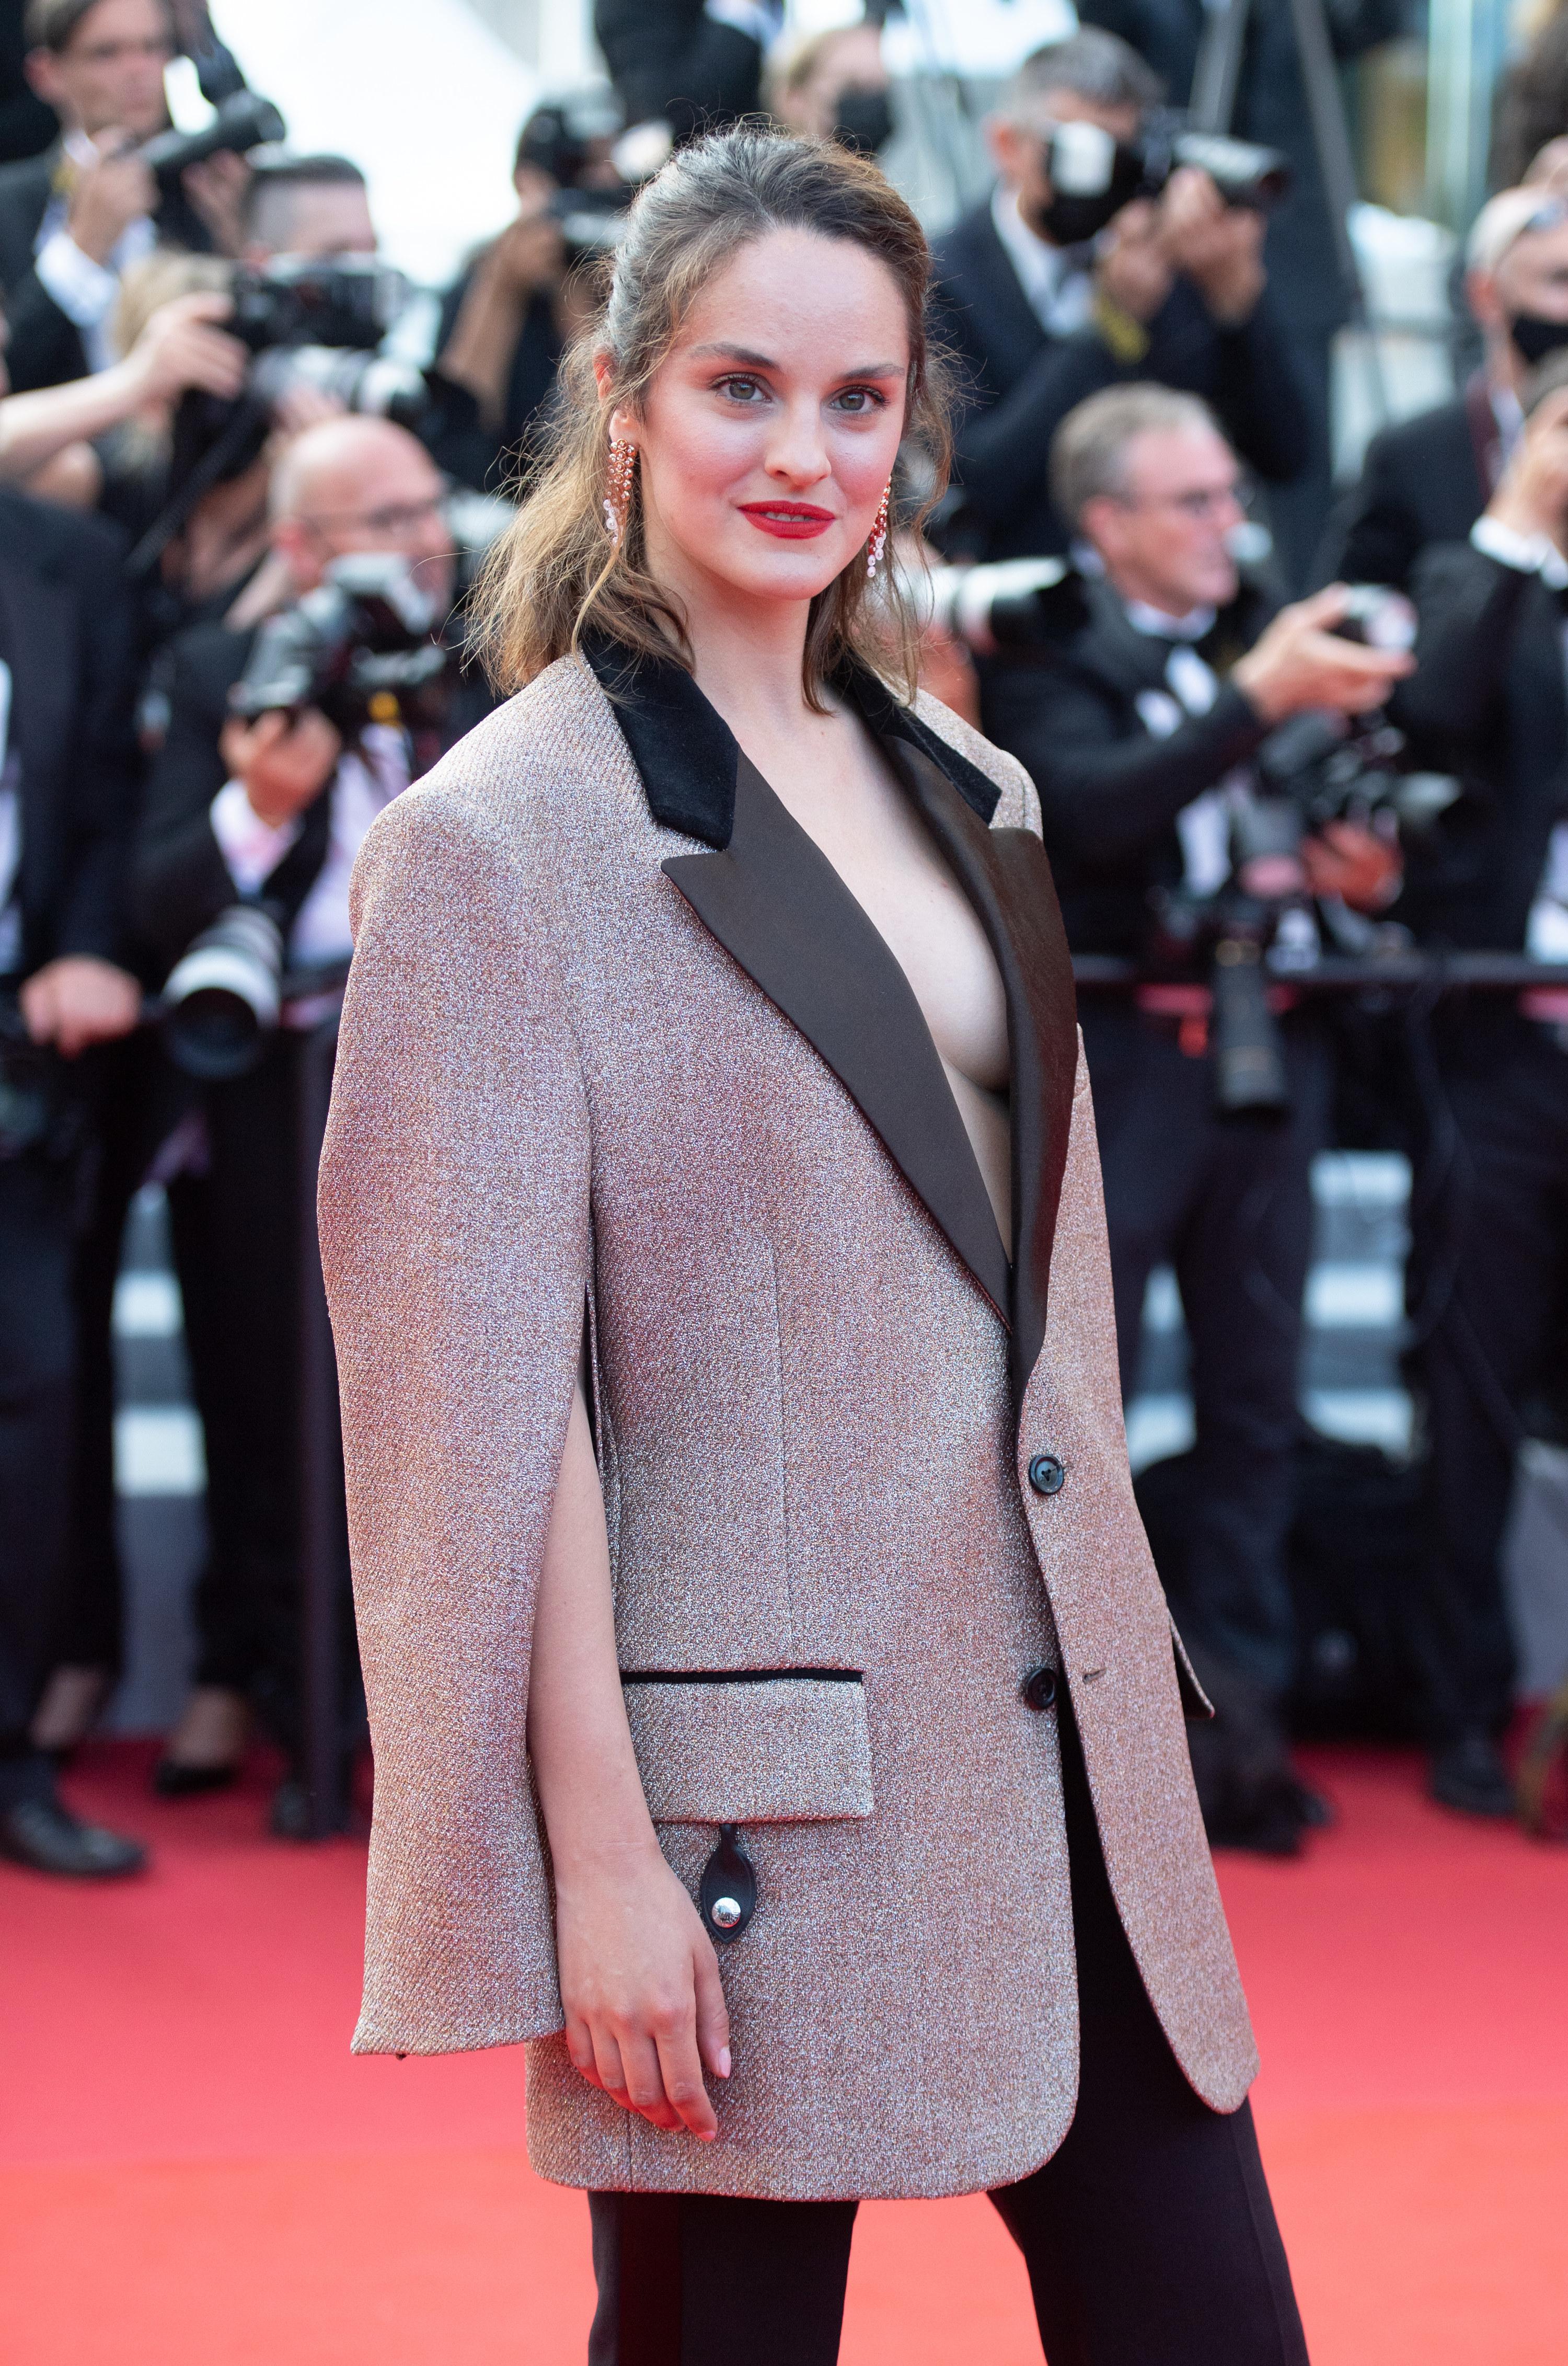 Noemie Merlant at the Cannes Film Festival